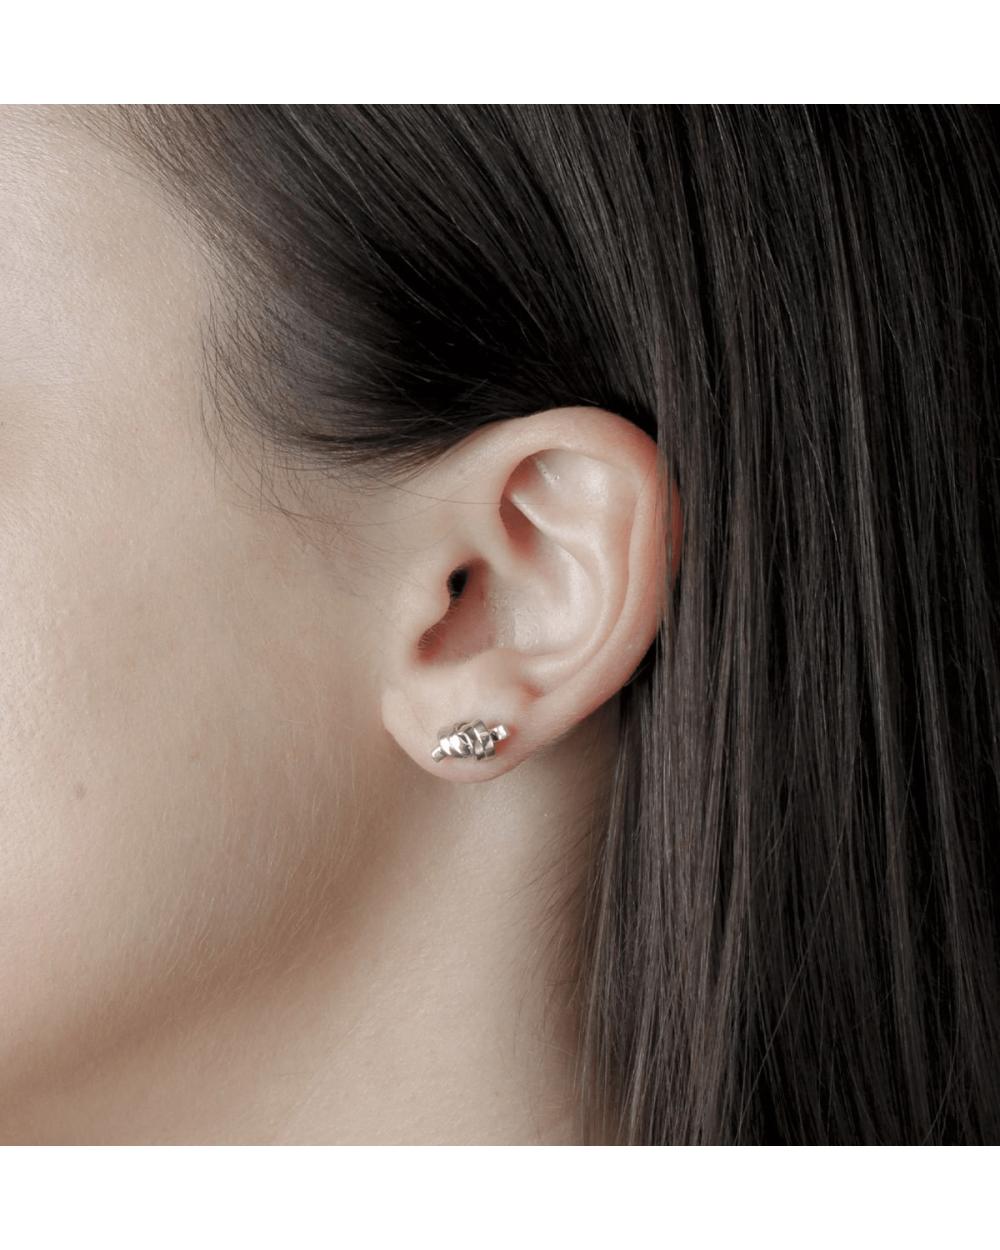 Earrings KNOT LOBE SINGLE EARRING NOVE25